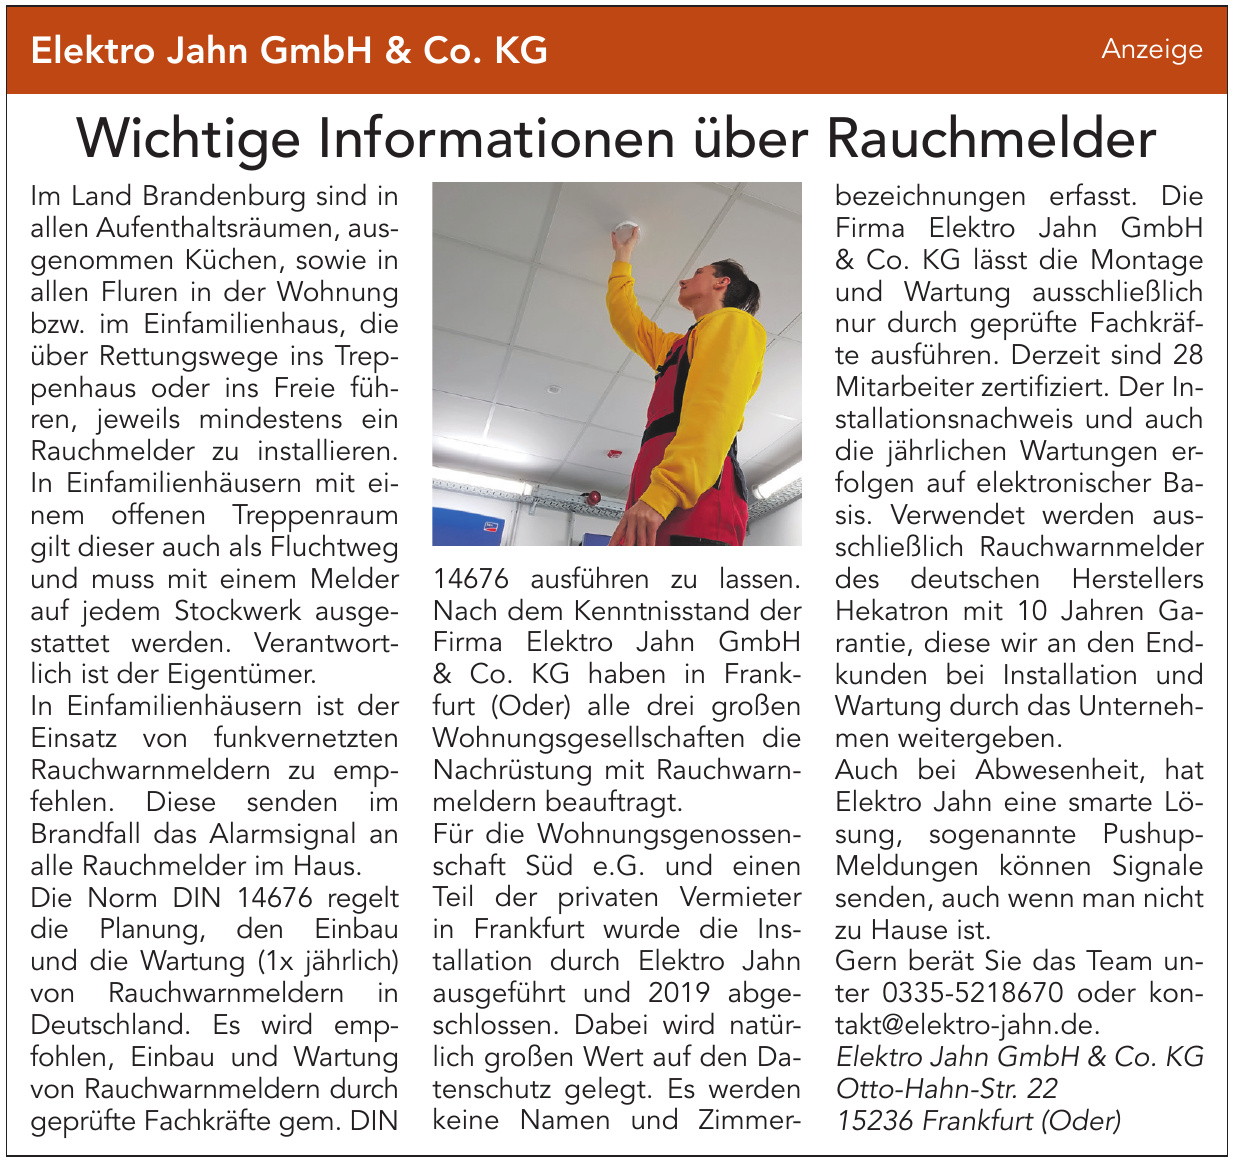 Elektro Jahn GmbH & Co. KG